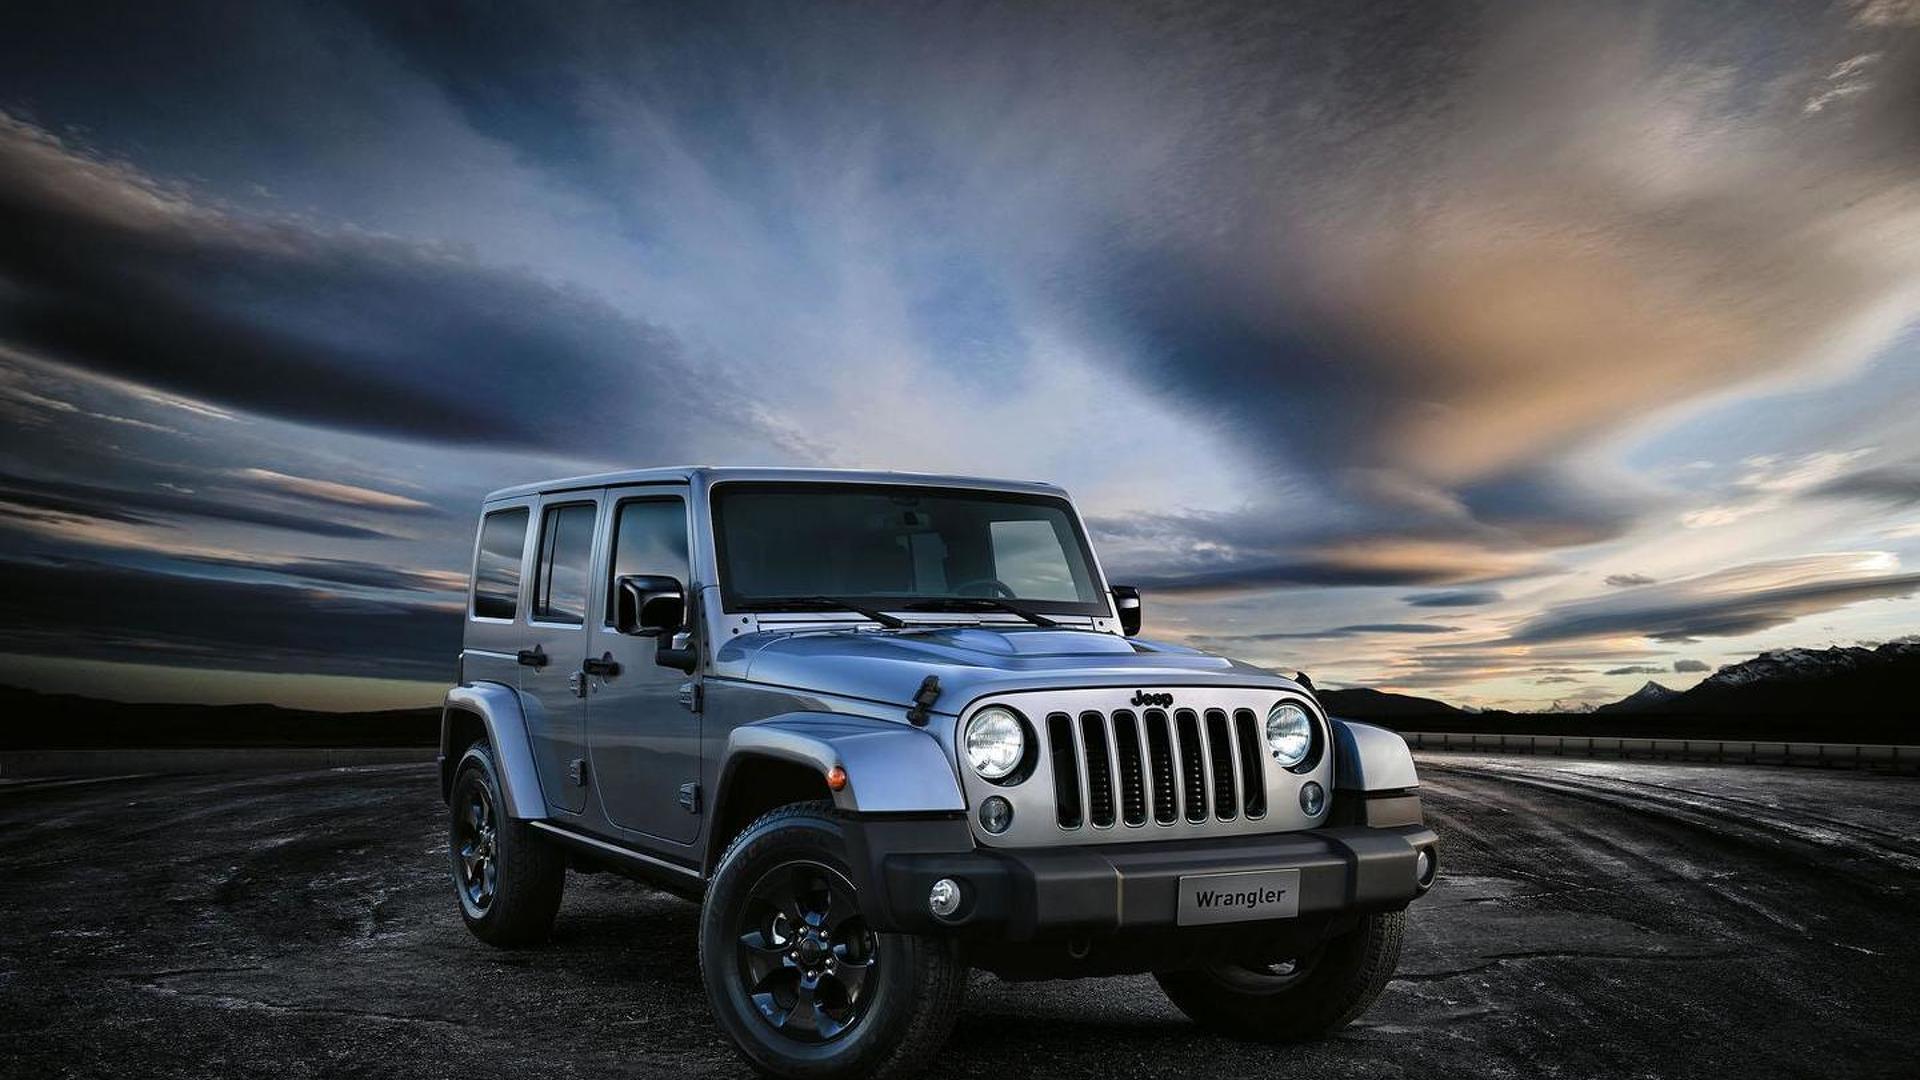 Jeep Wrangler Black Edition II unveiled for Geneva